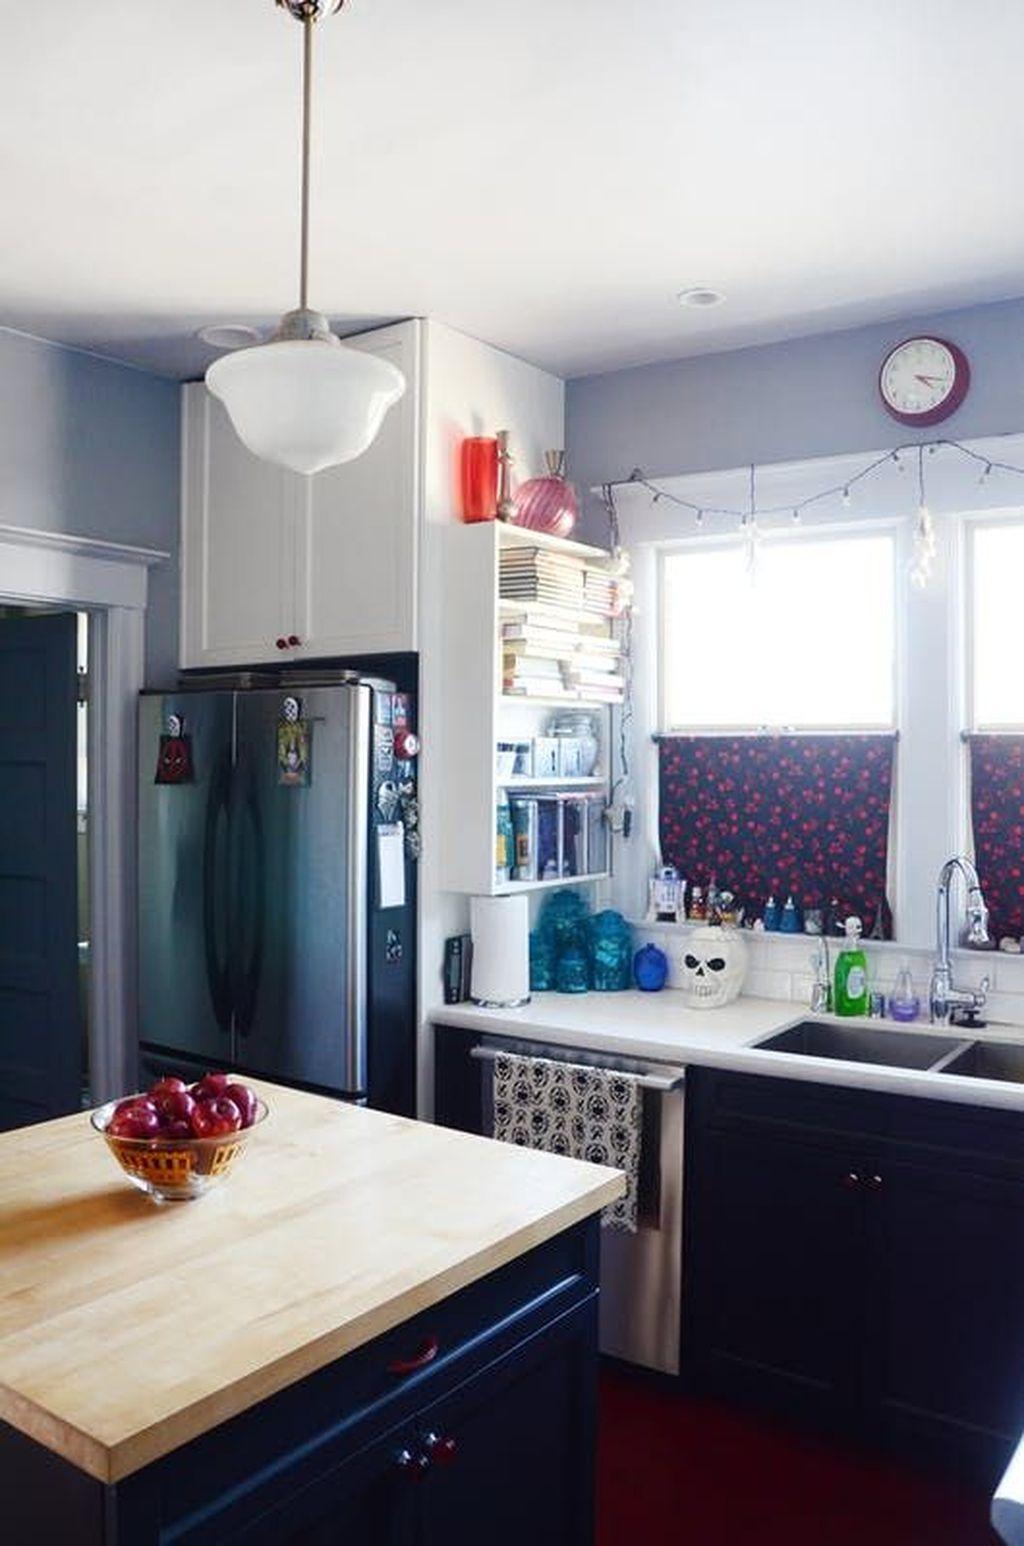 Fabulous Halloween Decoration Ideas For Your Kitchen 15